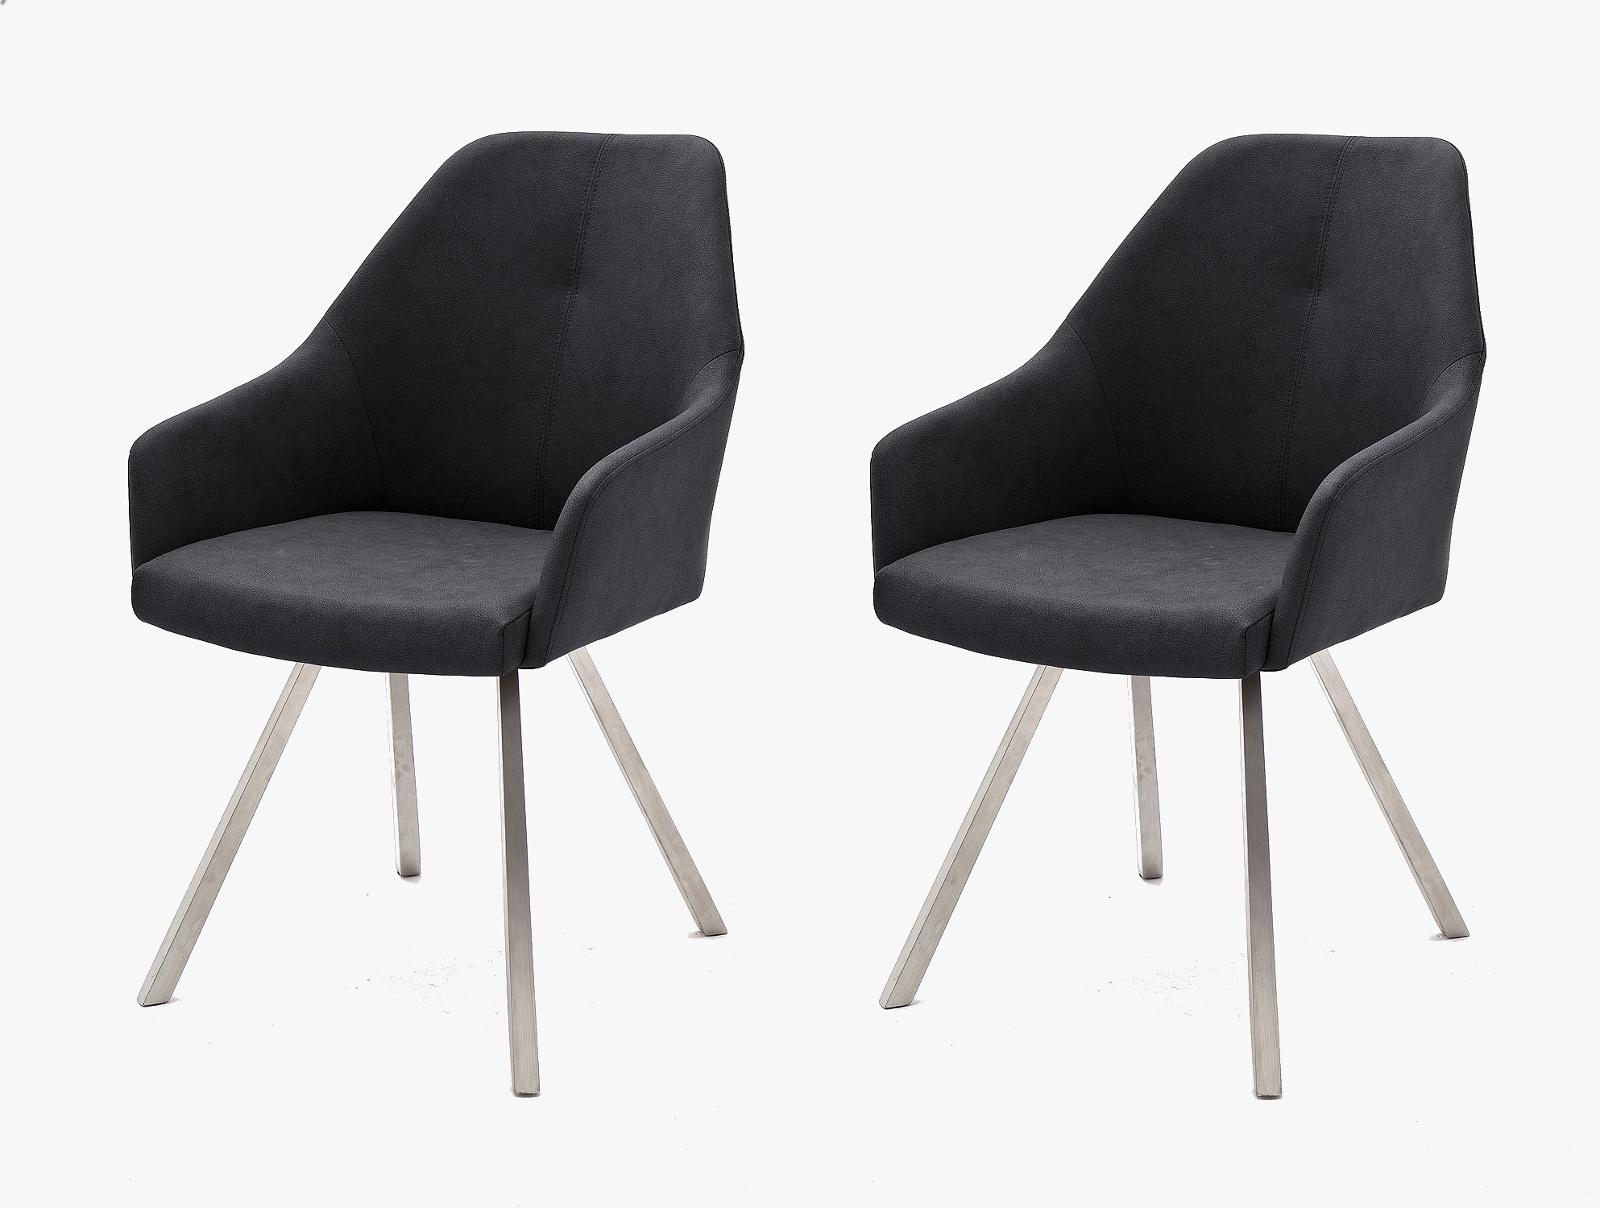 2 x Stuhl Madita in Anthrazit Kunstleder und Edelstahl 4 Fuß eckig Esszimmerstuhl 2er Set Armlehnenstuhl Schalenstuhl